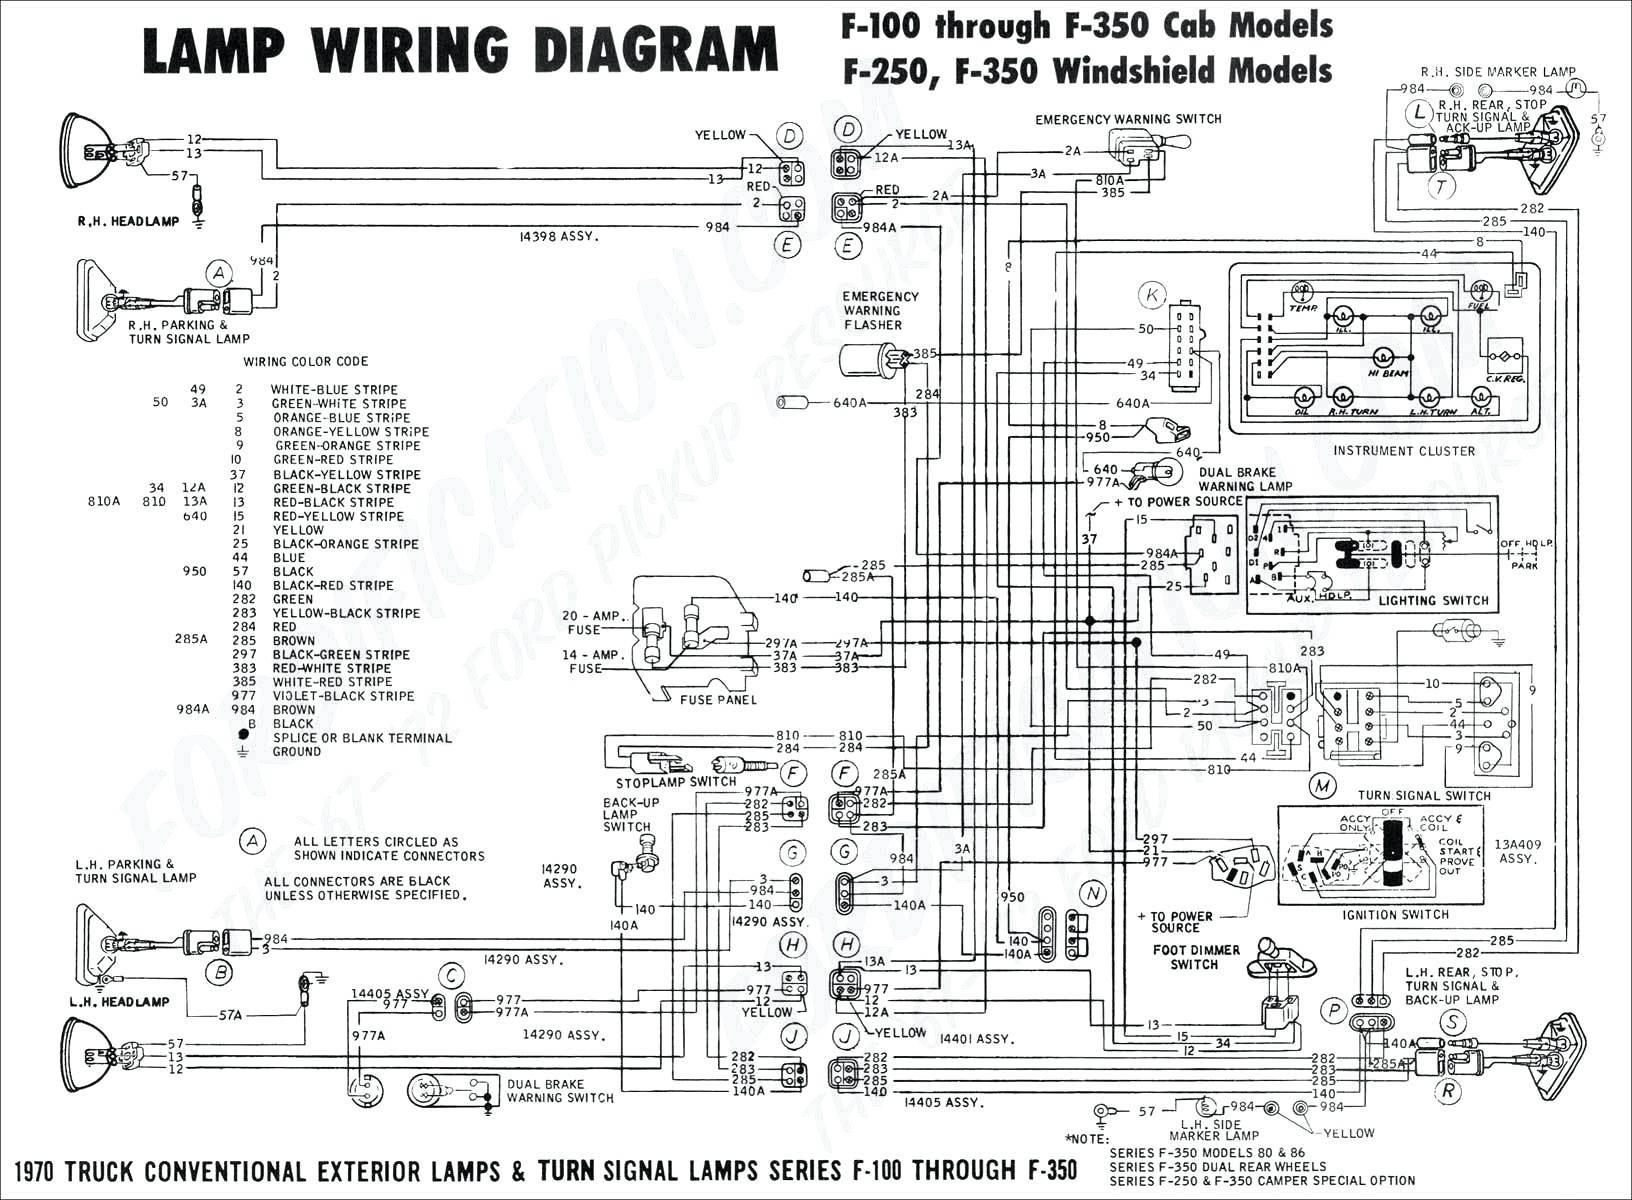 2006 Bmw 325i Engine Diagram 2000 ford Ranger Horn Wiring Another Blog About Wiring Diagram • Of 2006 Bmw 325i Engine Diagram